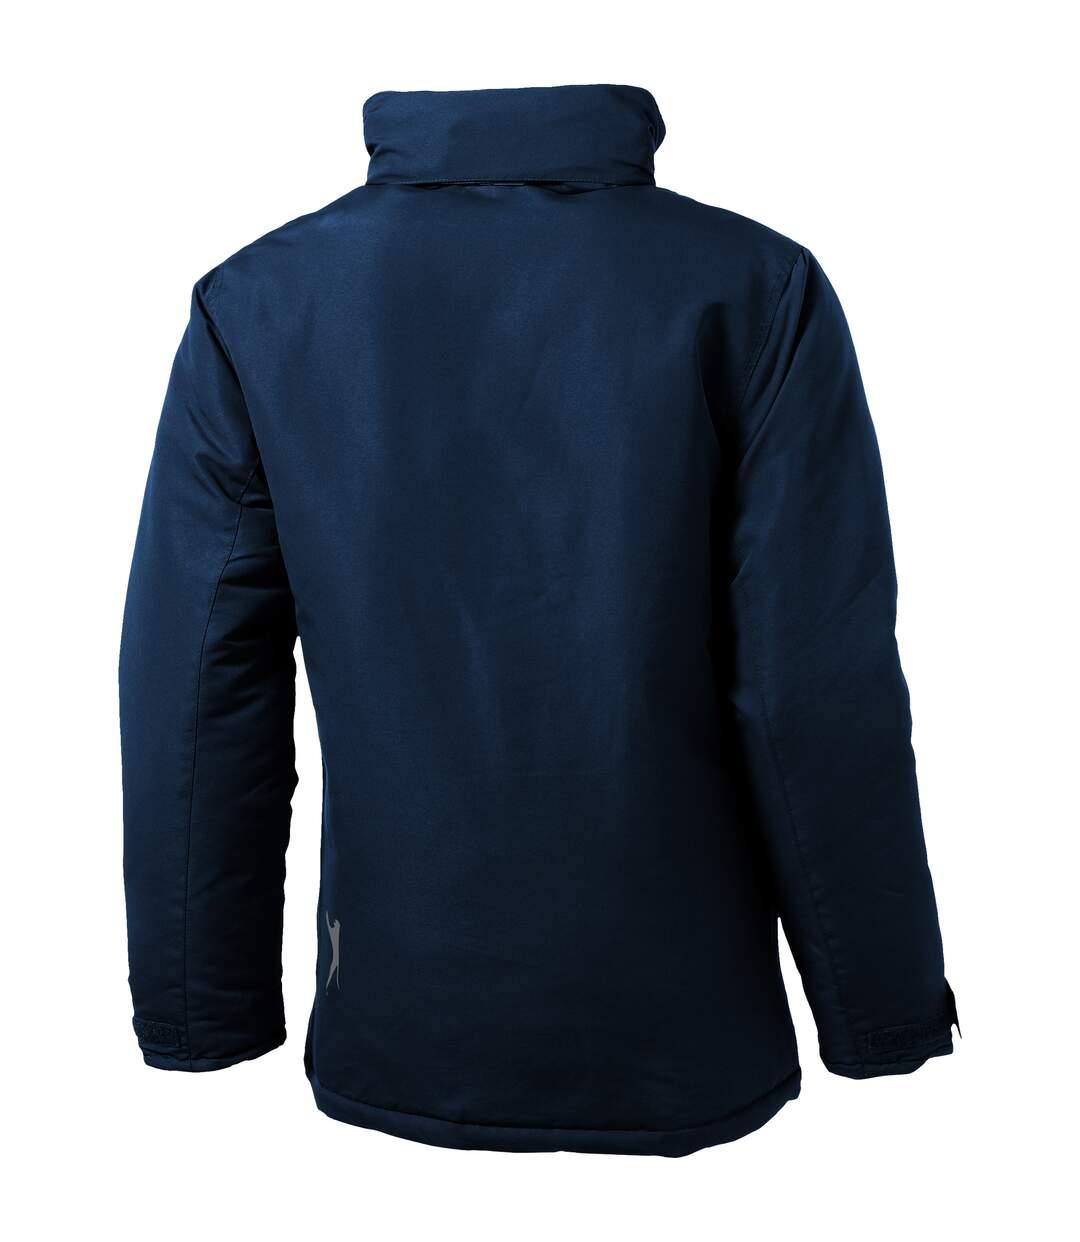 Slazenger Mens Under Spin Insulated Jacket (Navy) - UTPF1783